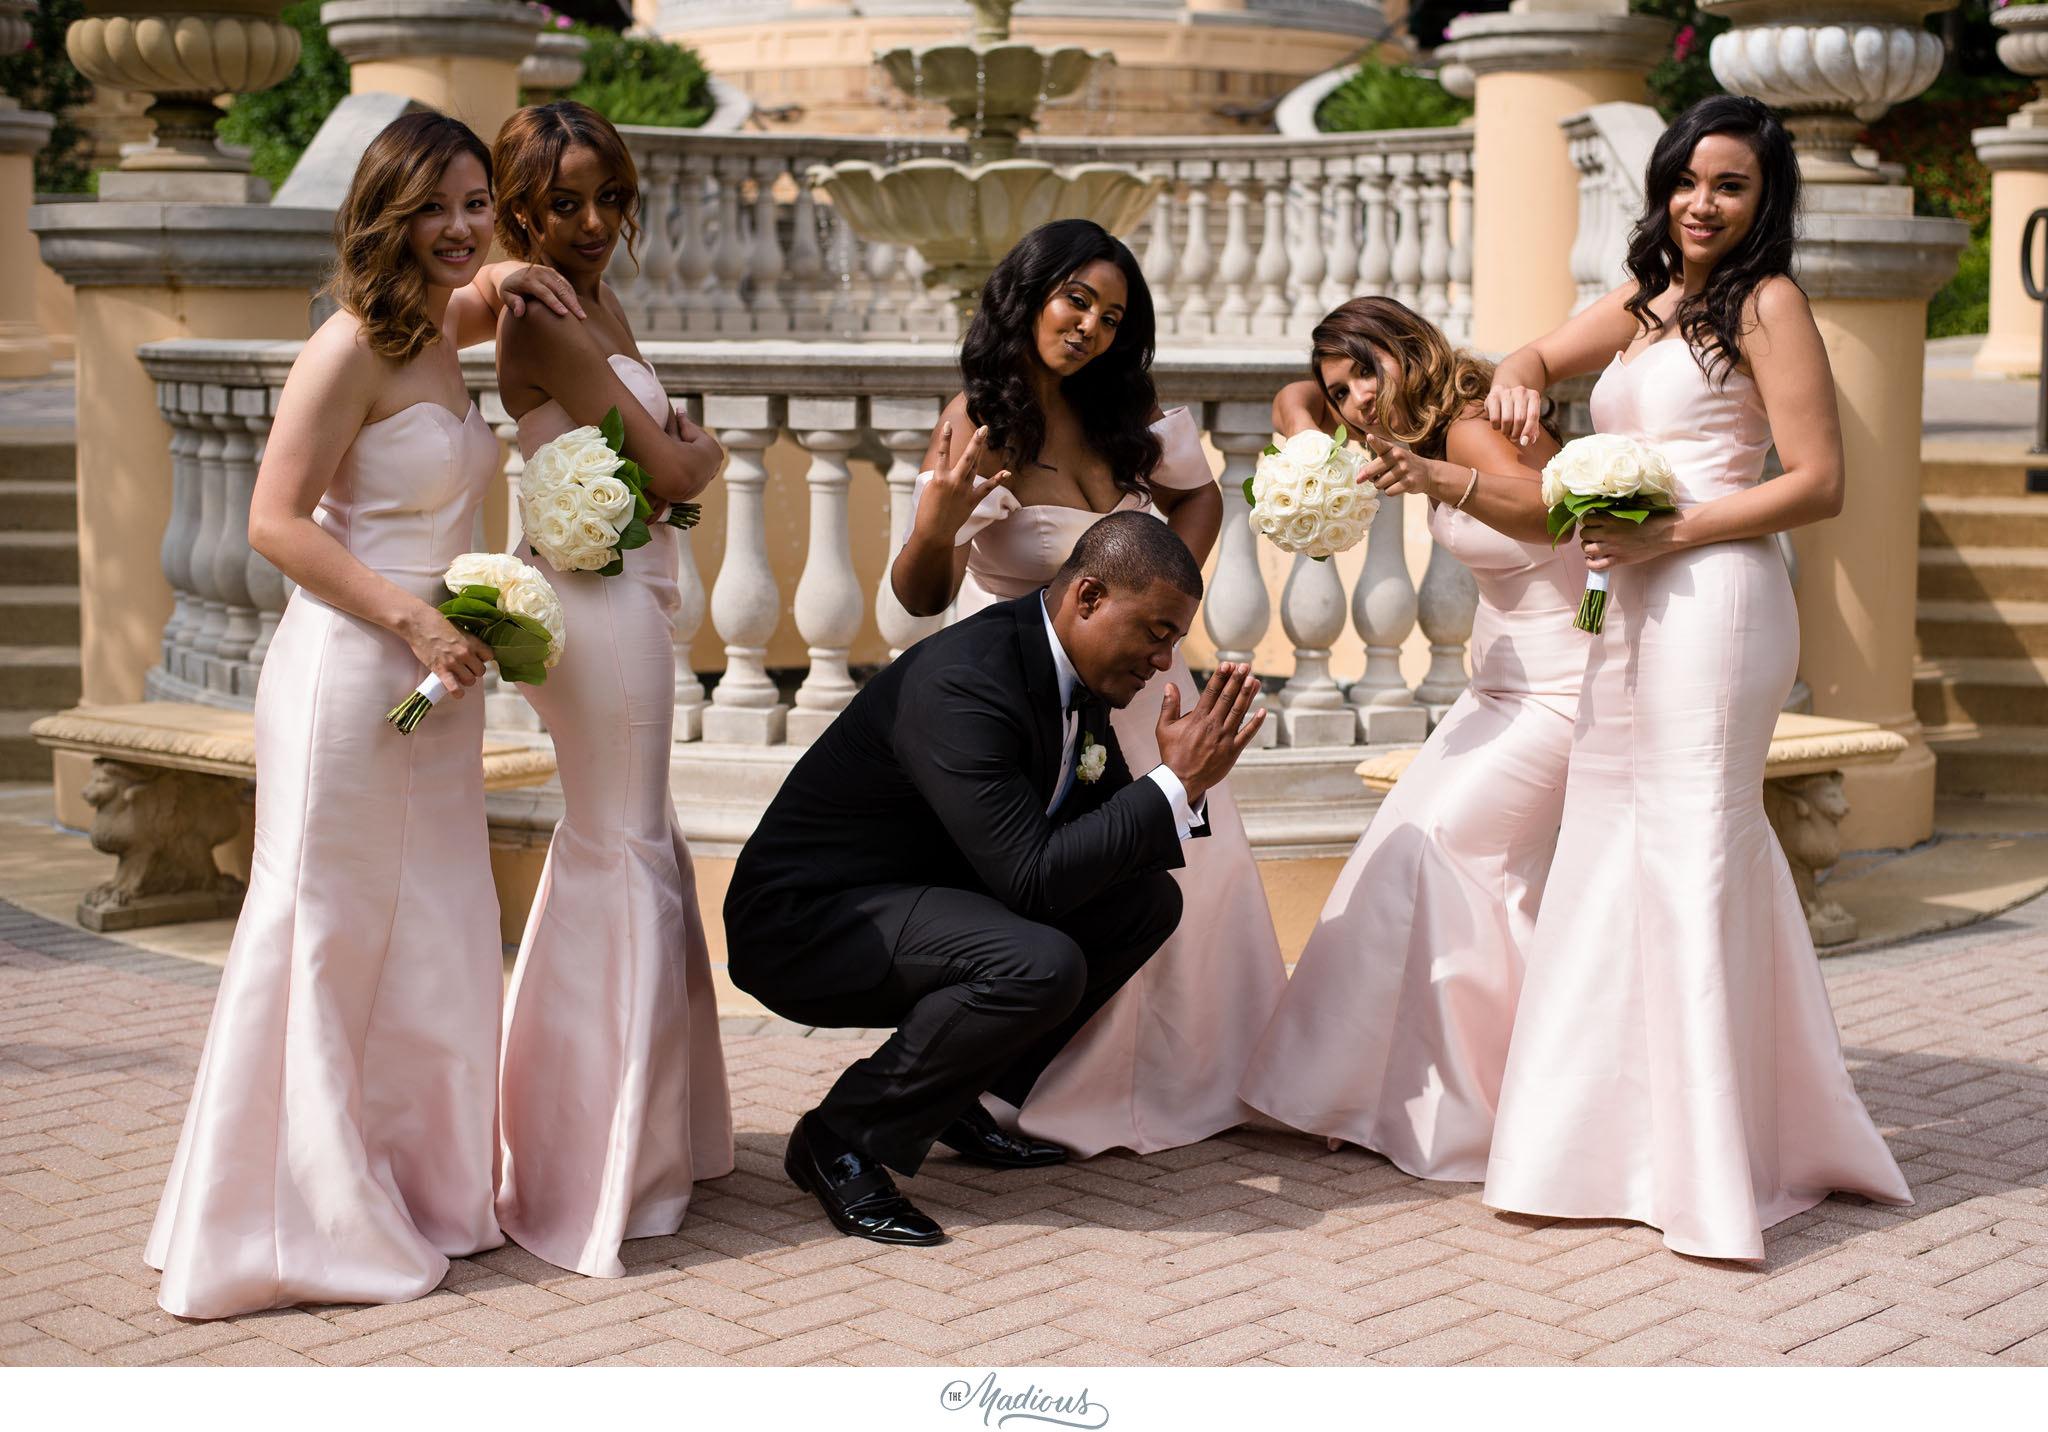 nmwa+wedding,+women+in+the+arts+wedding,+ethiopian+wedding,+dc+wedding+0141.jpg